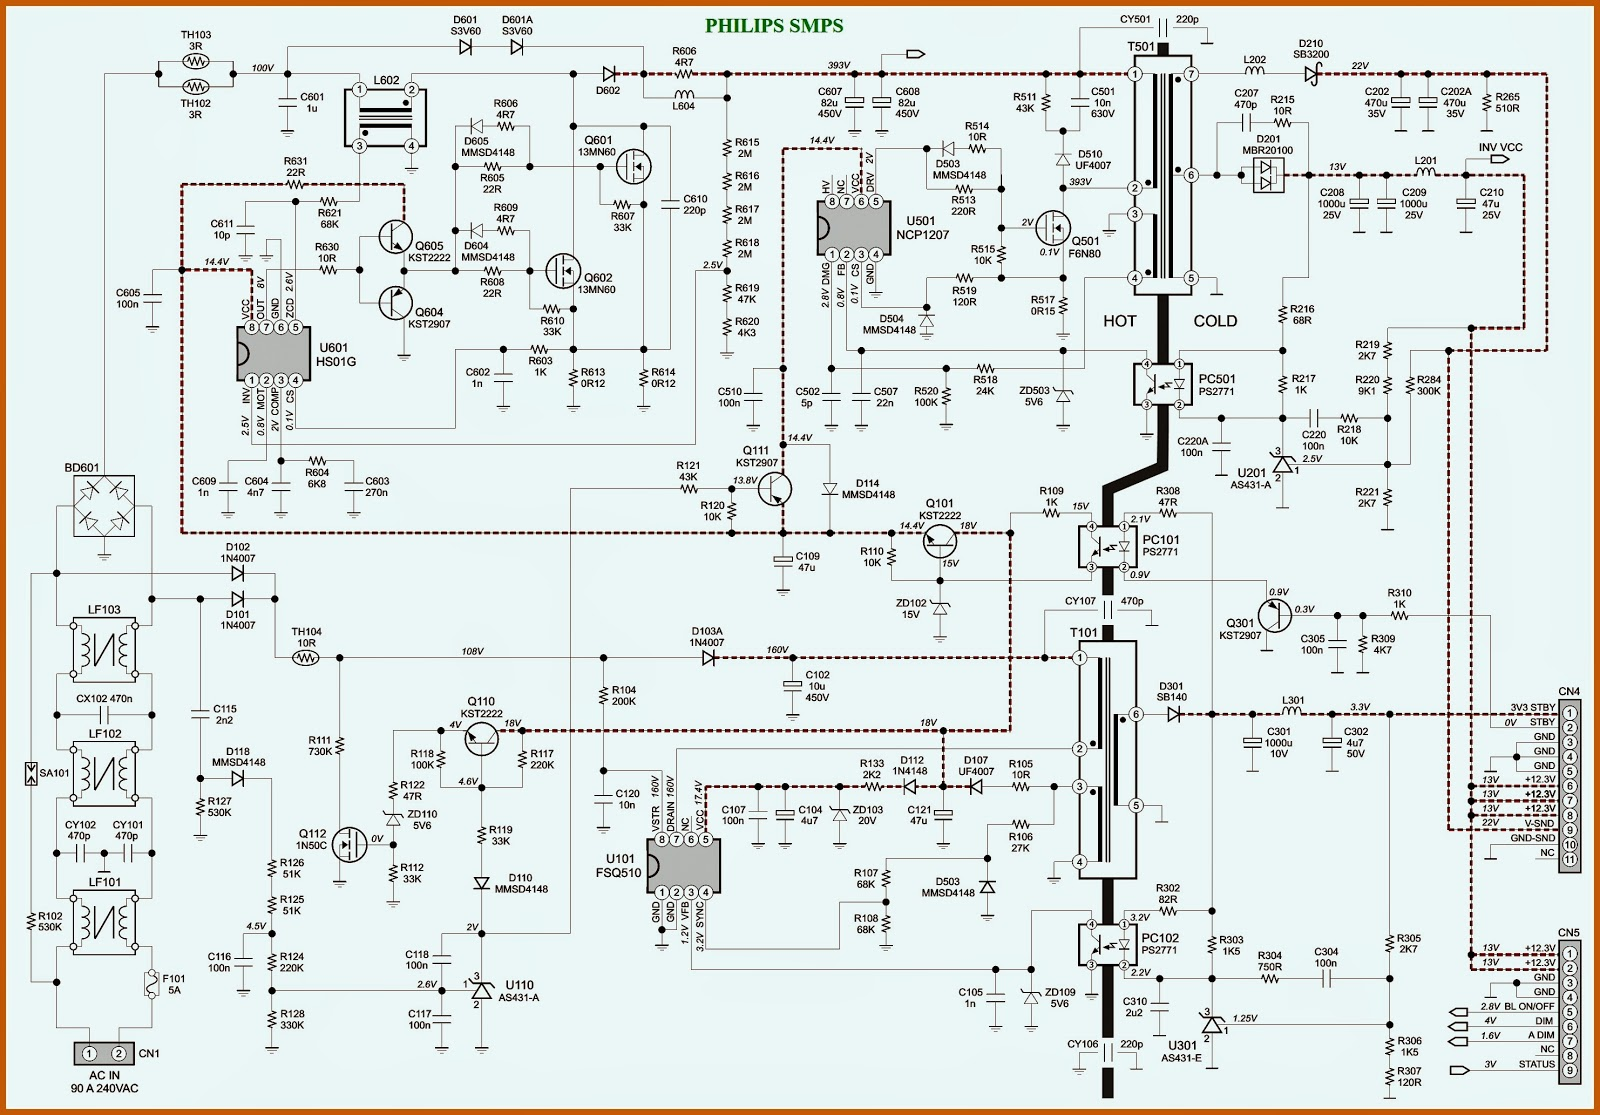 tv circuit board diagram repair hk 9441  switch mode power supply circuit diagram also samsung  power supply circuit diagram also